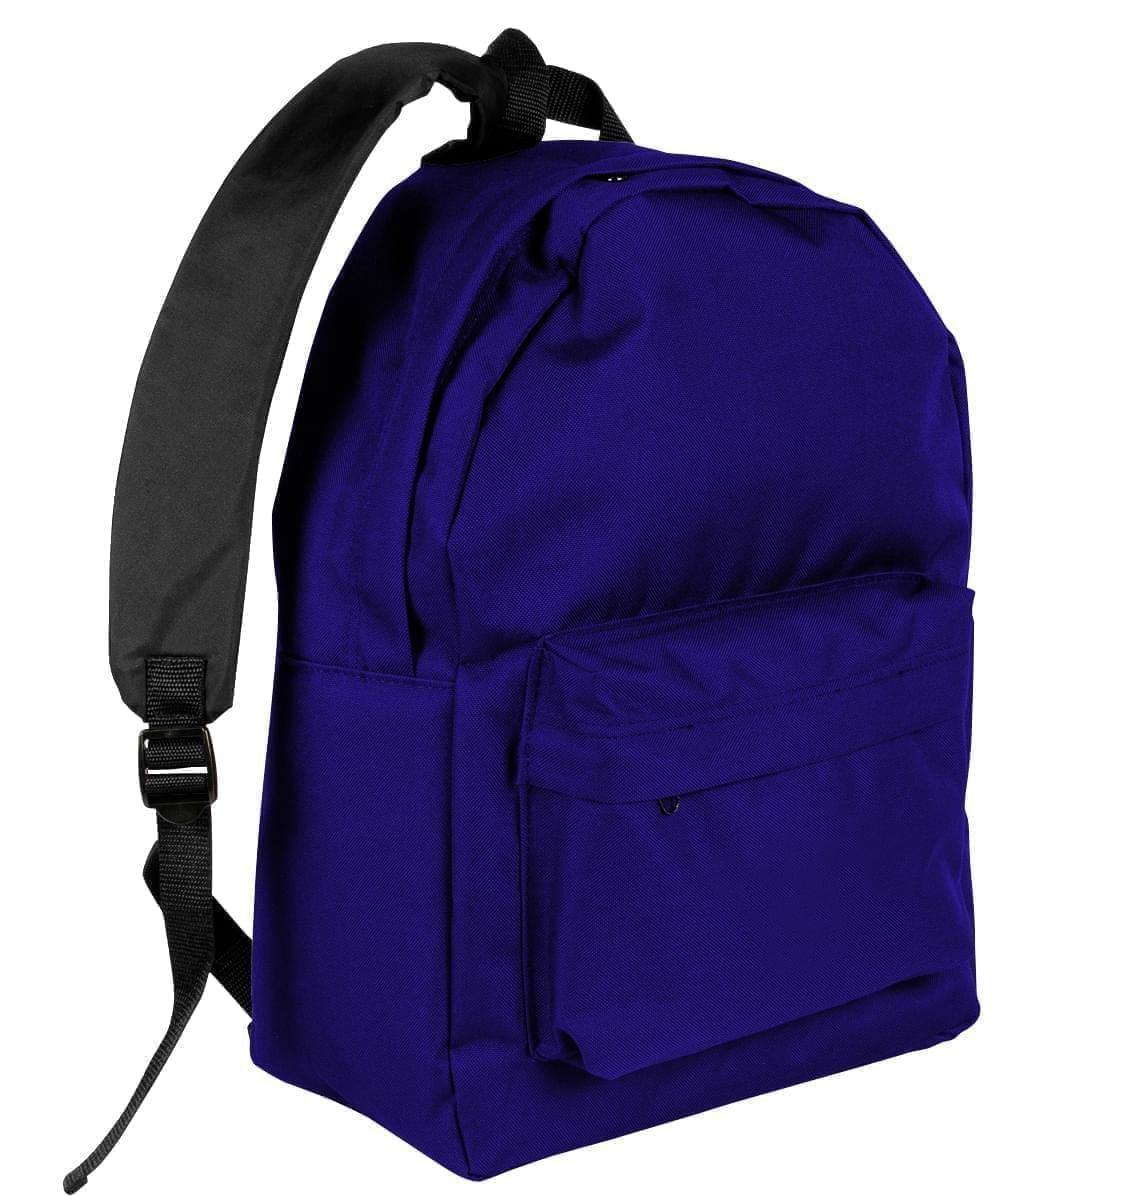 USA Made Nylon Poly Backpack Knapsacks, Purple-Black, 8960-AYR